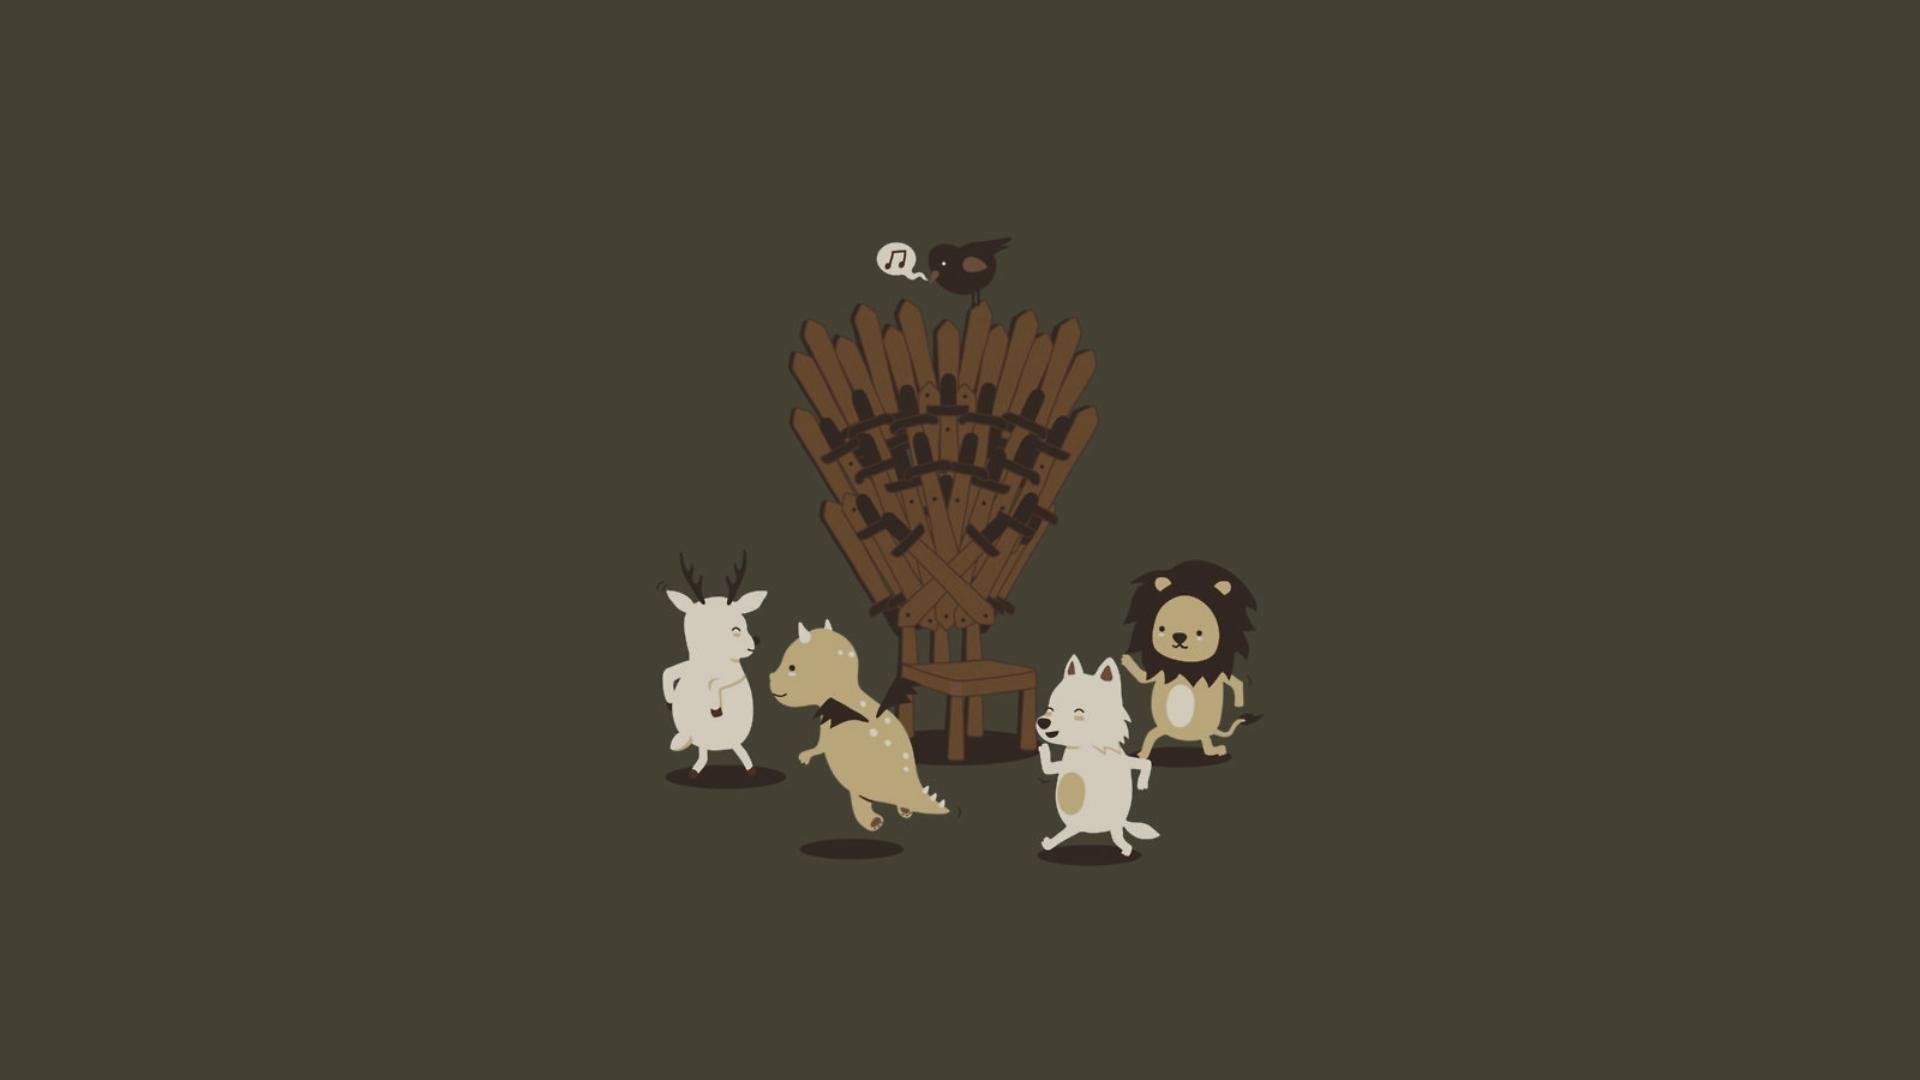 1920x1200 Game Of Thrones House Wallpaper Album Download 1920x1080 Baratheon